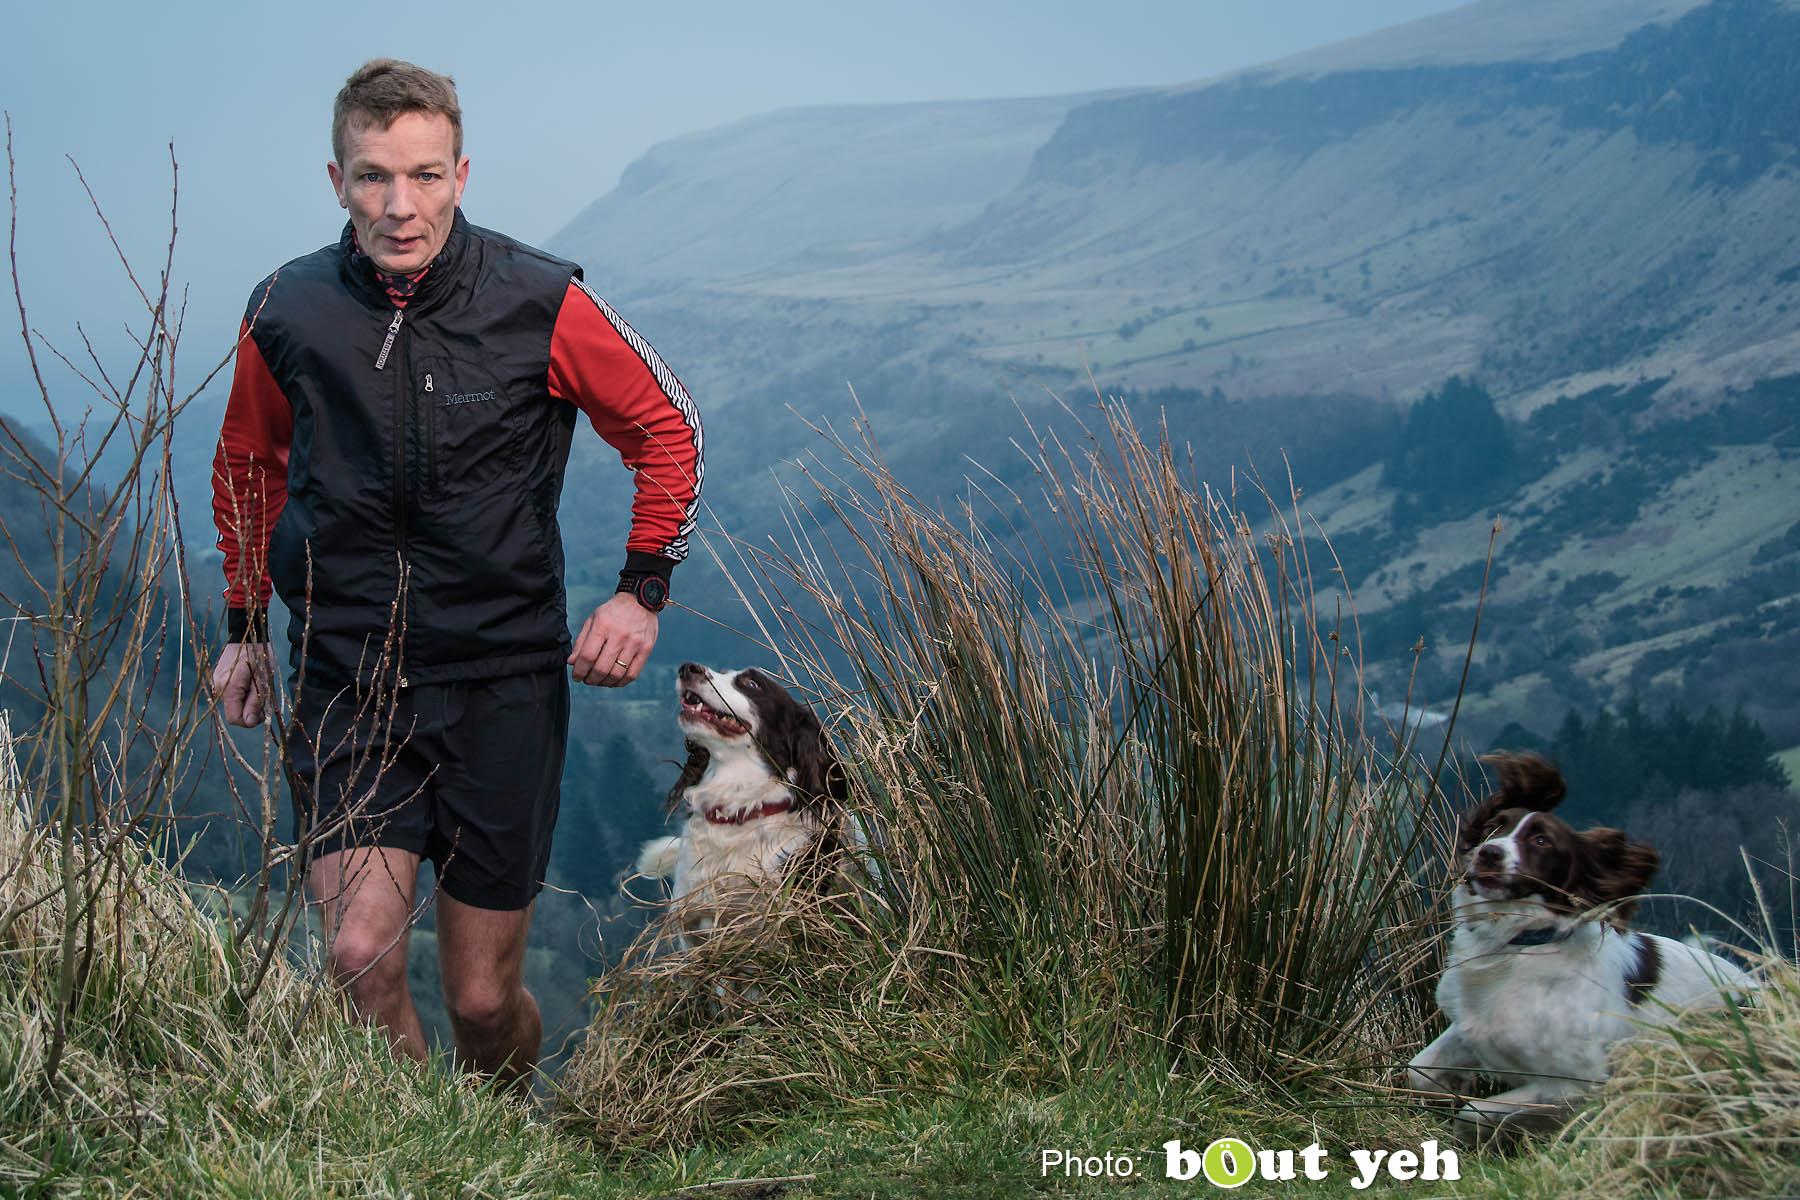 Mark, of Ballymena Runners, at Glenariff Forest, Northern Ireland. Photo 0737.